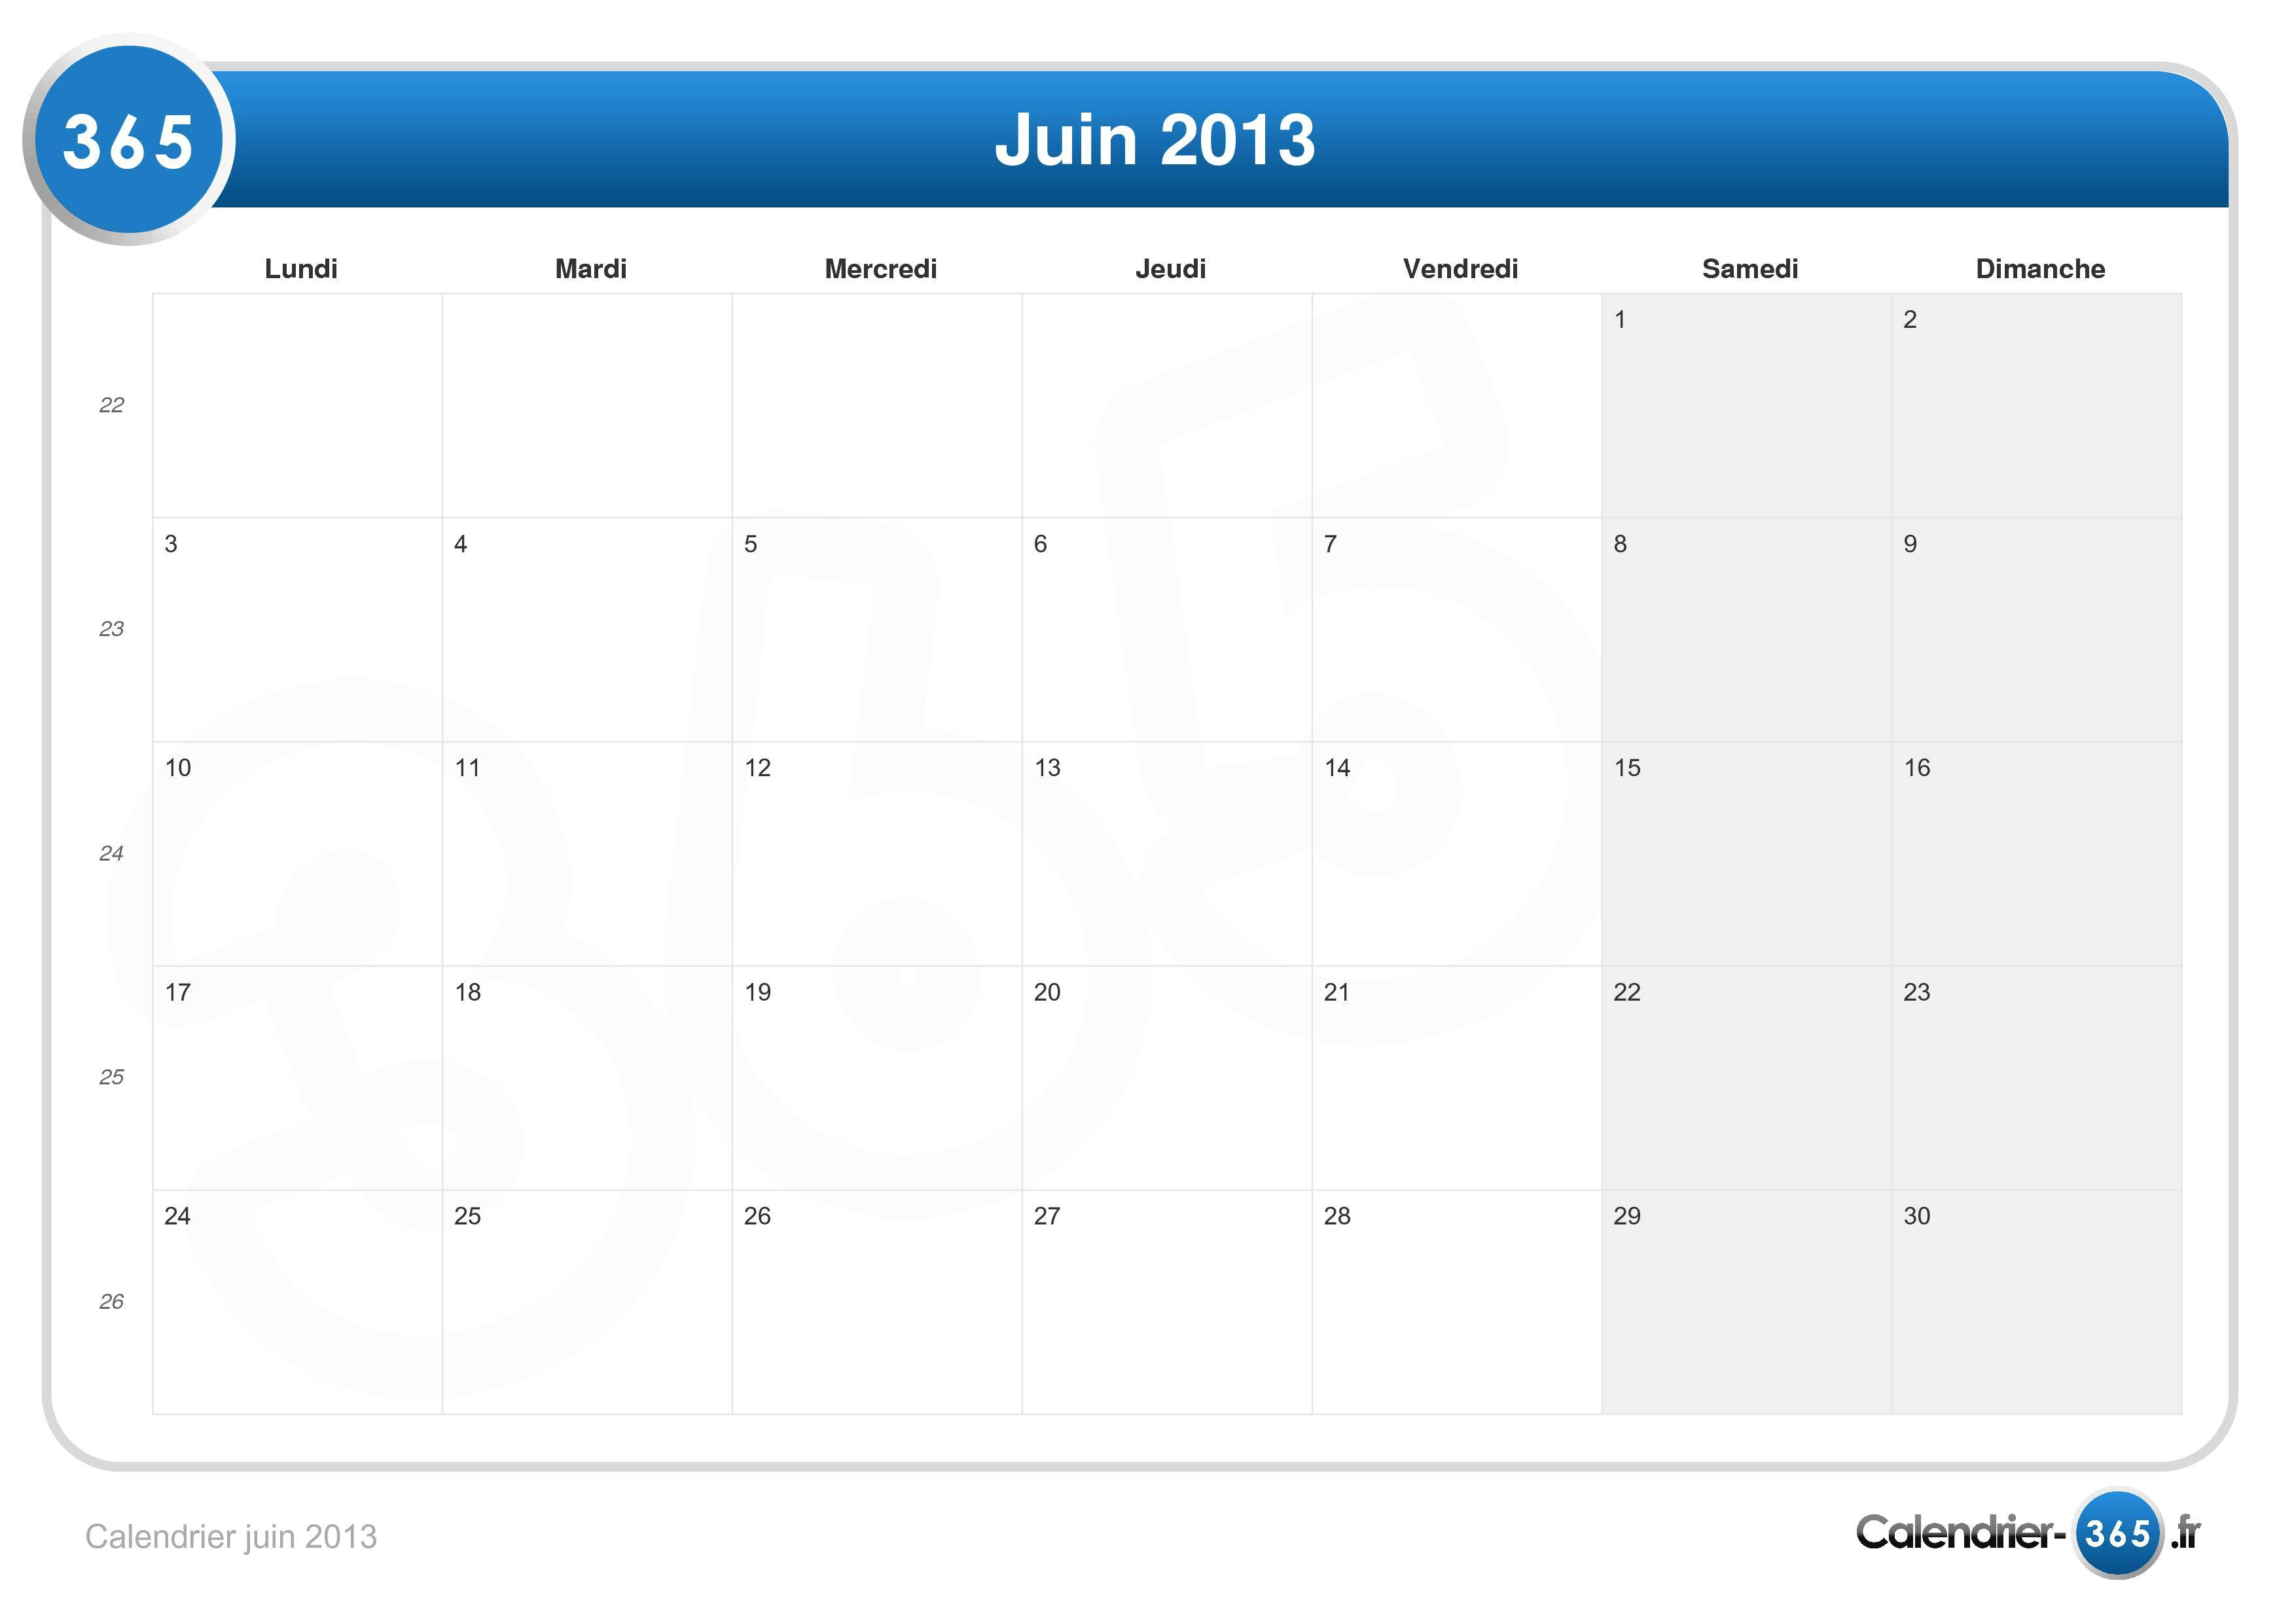 Calendrier Juin 2013